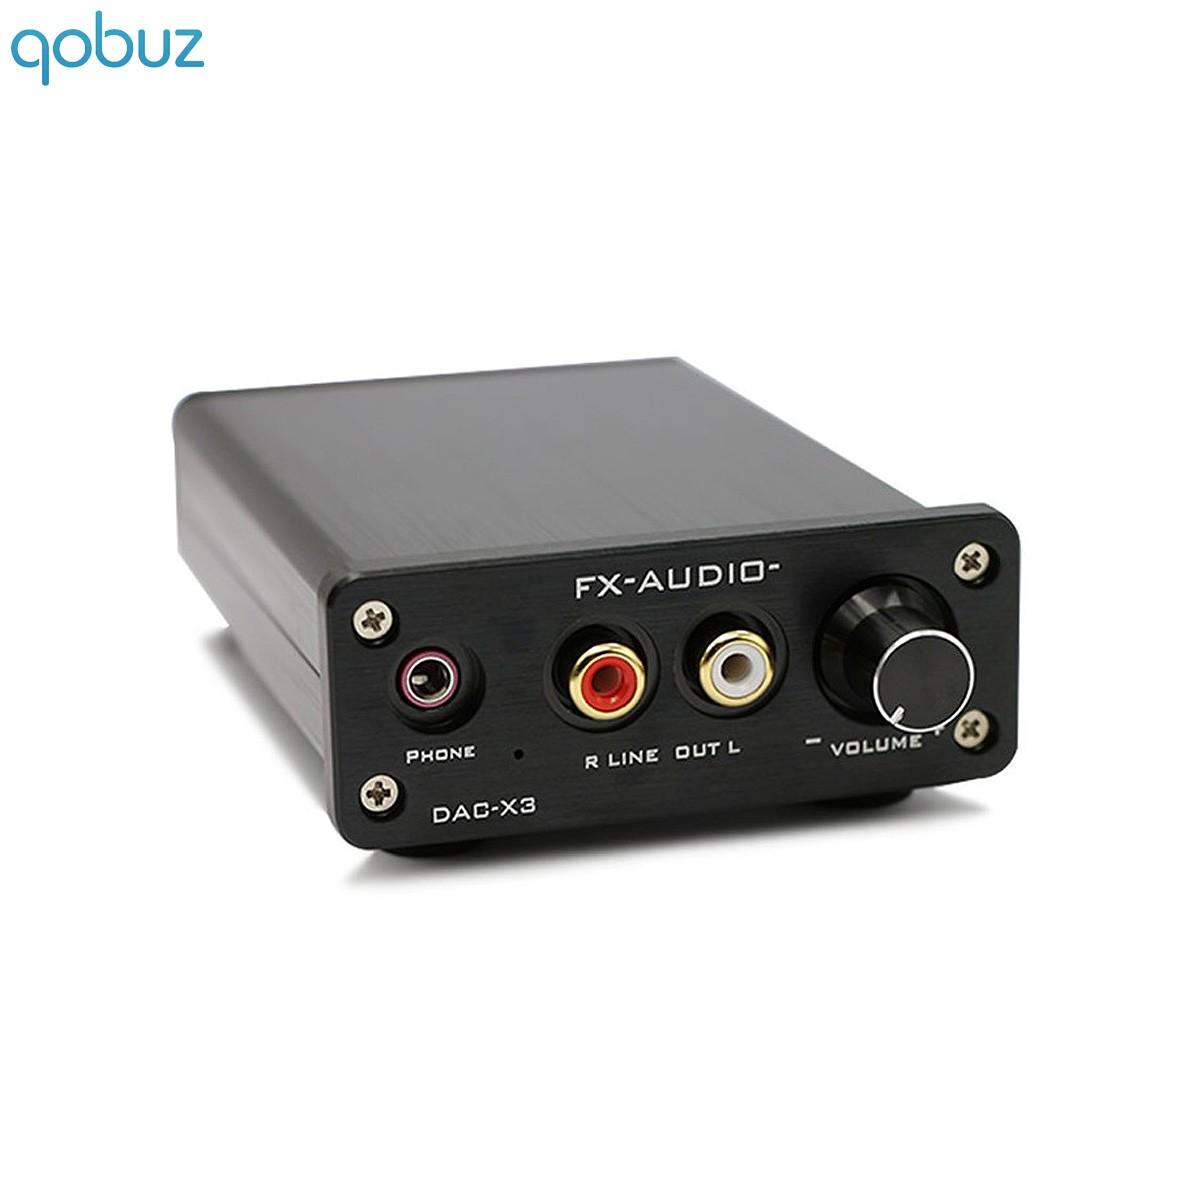 FX-AUDIO DAC-X3 DAC / Headphone amplifier CS4344 24bit / 192kHz Black